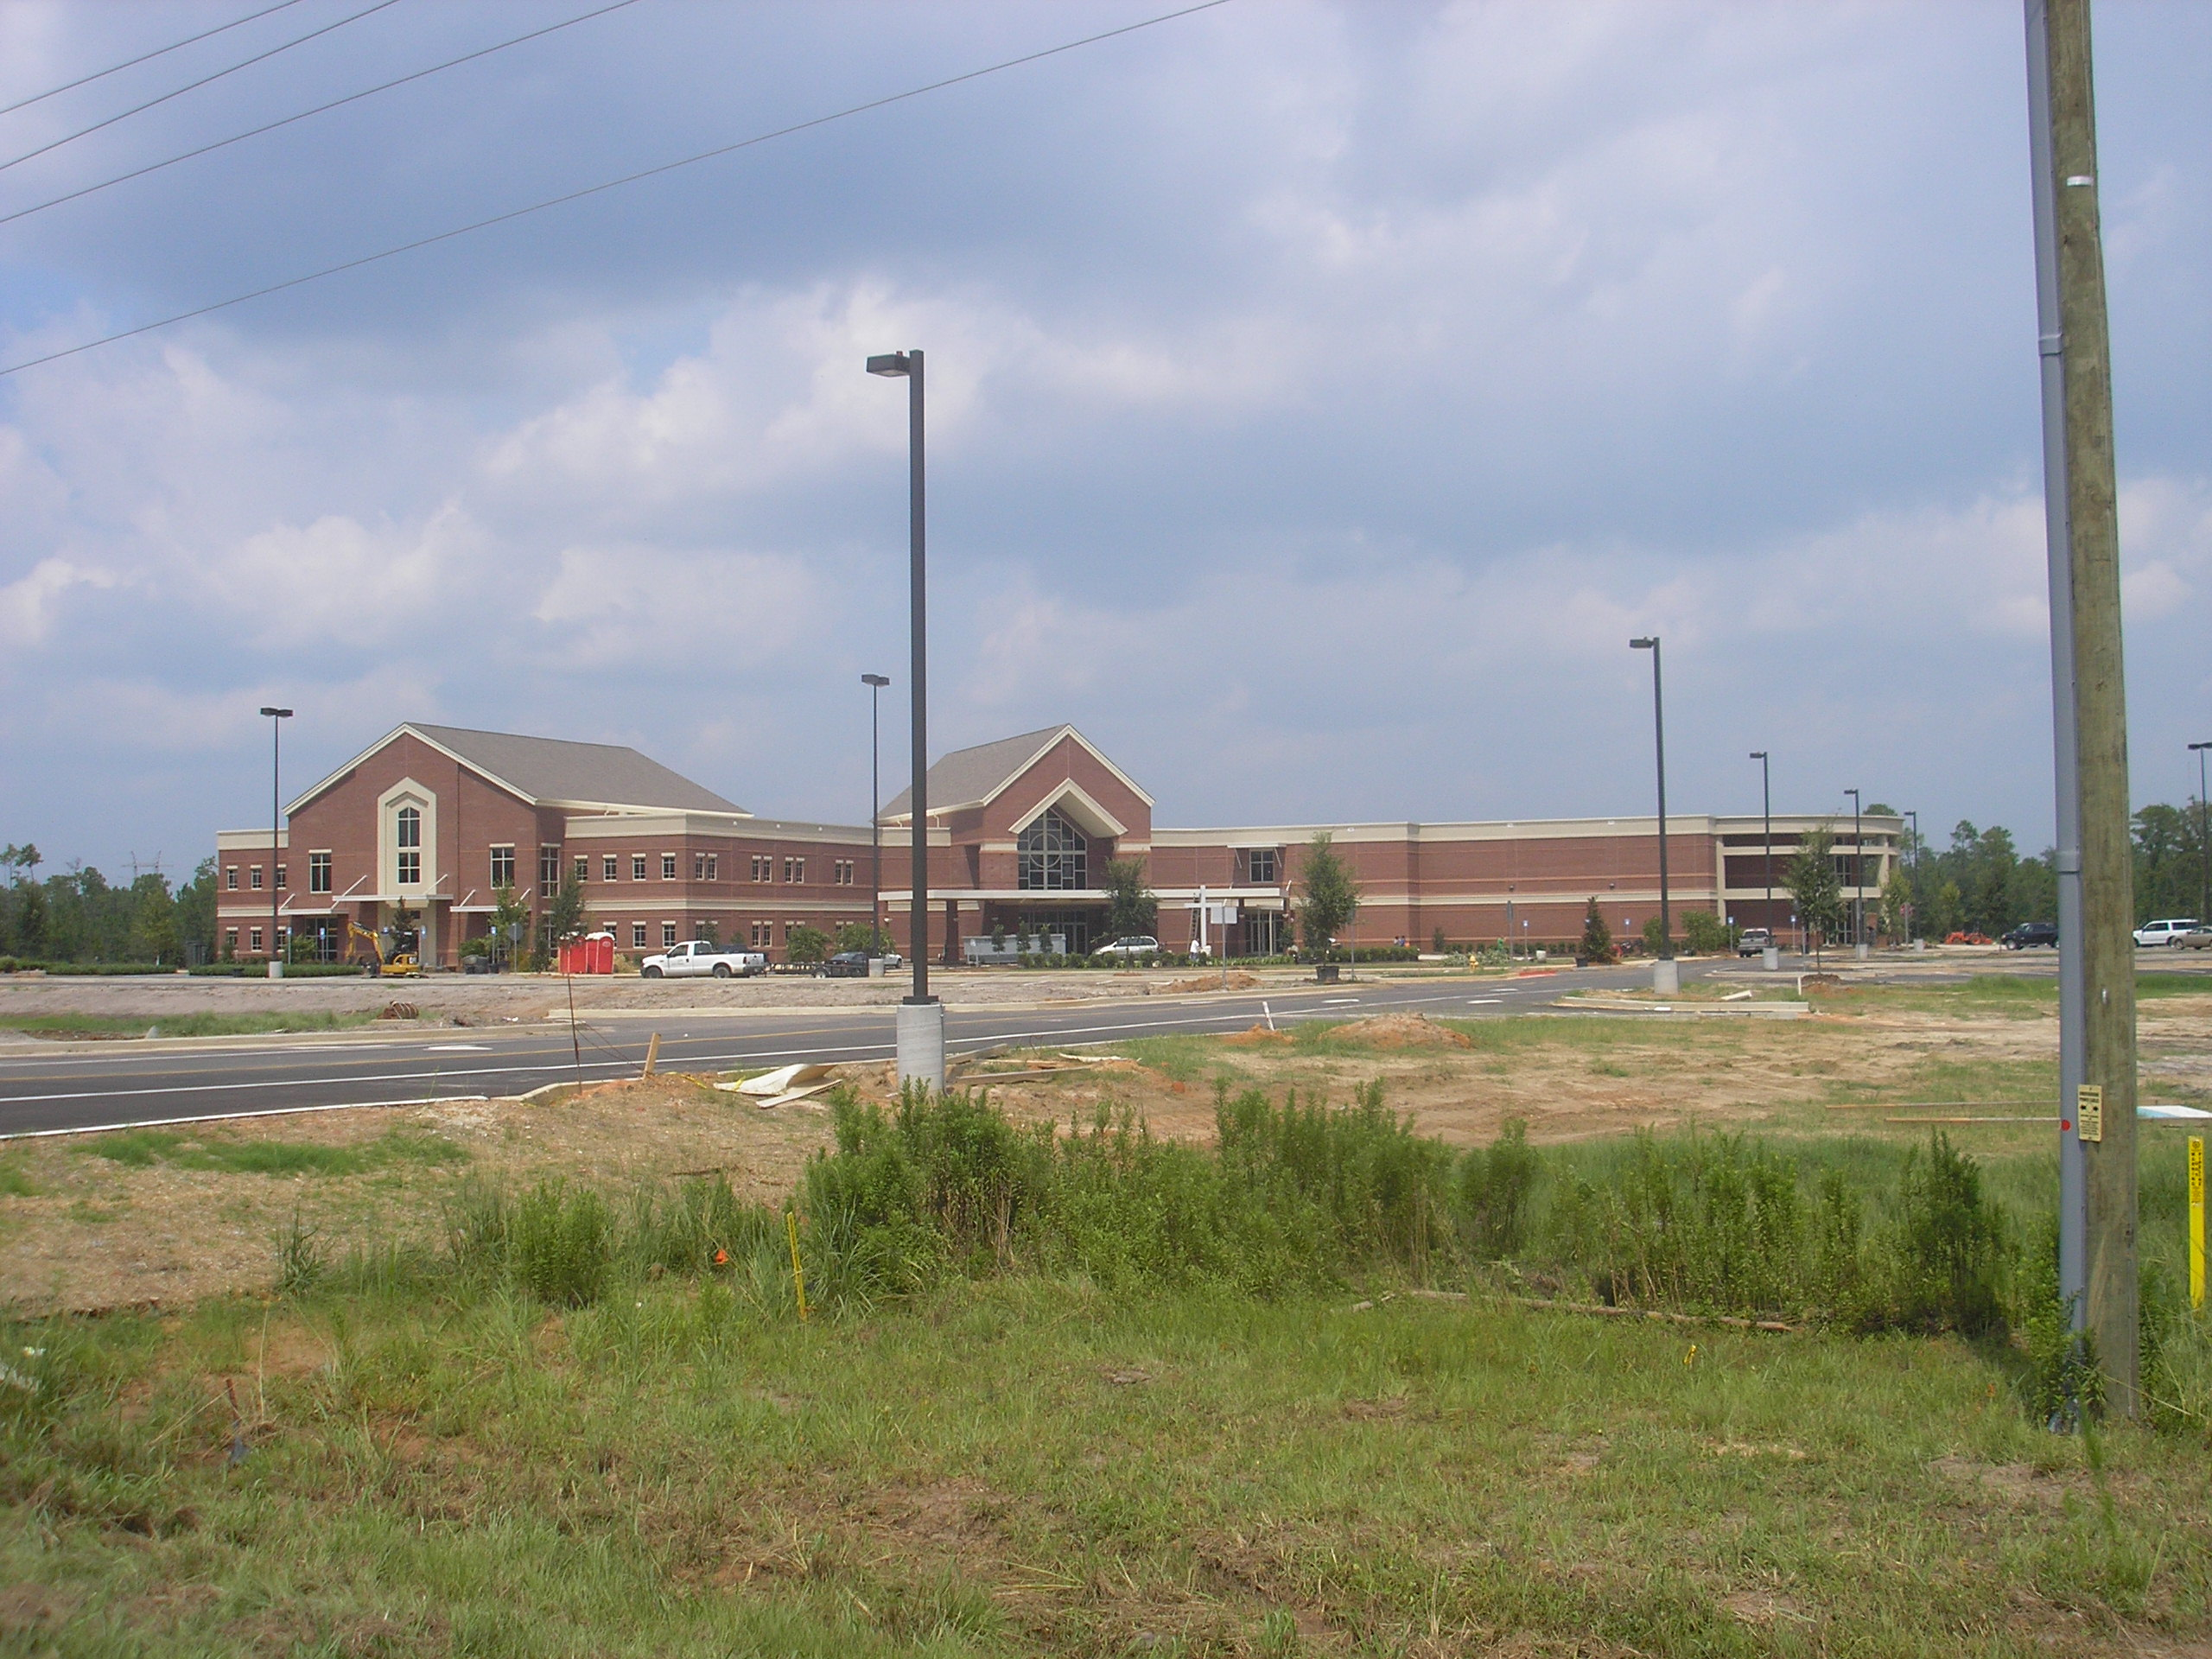 First Baptist Church Gulfport post-Katrina location